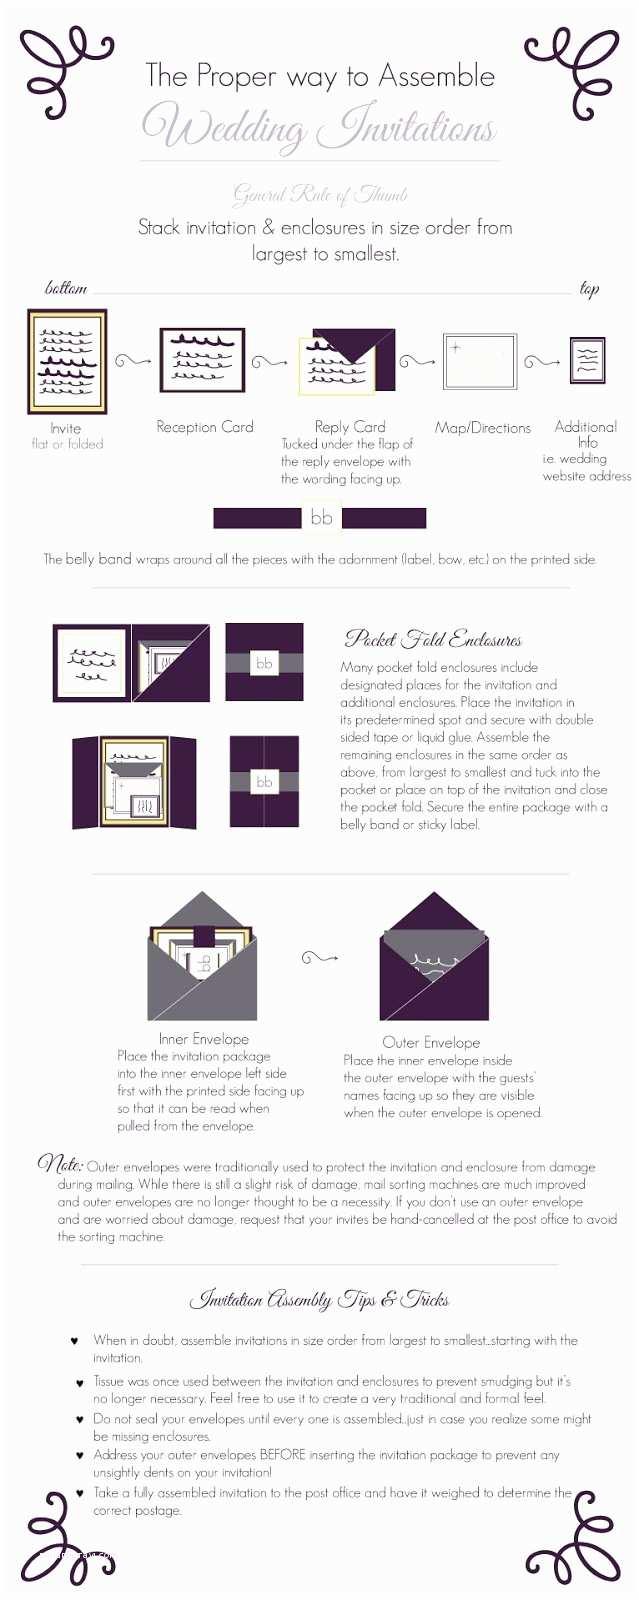 Assembling Wedding Invitations the Proper Way to assemble Wedding Invitations Free